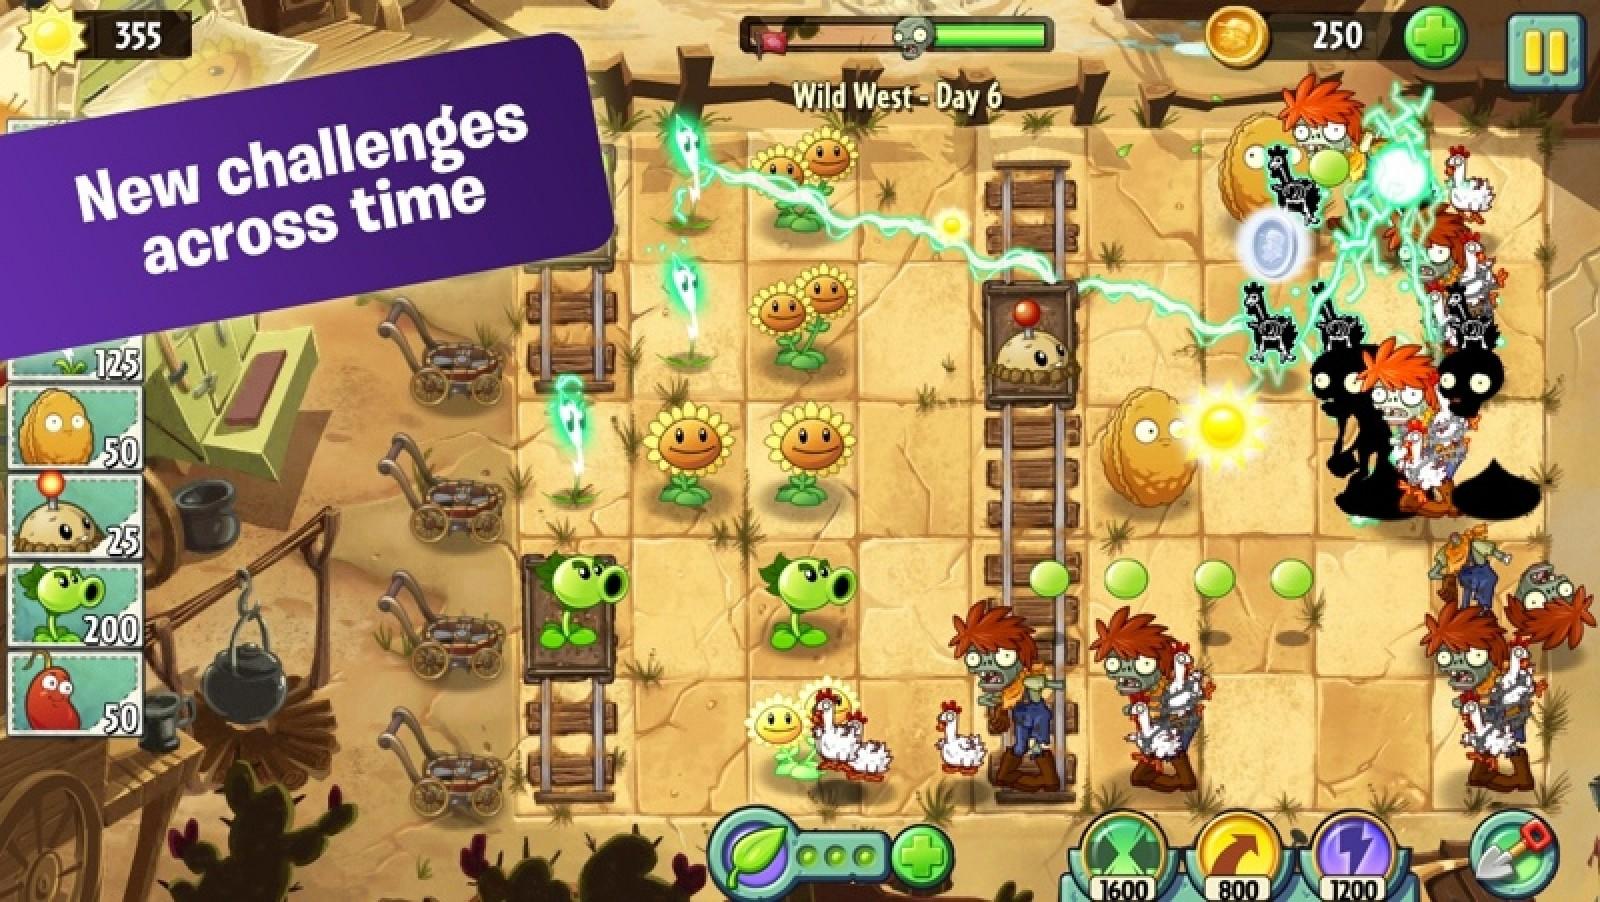 download plants vs zombies 2 apk free full version